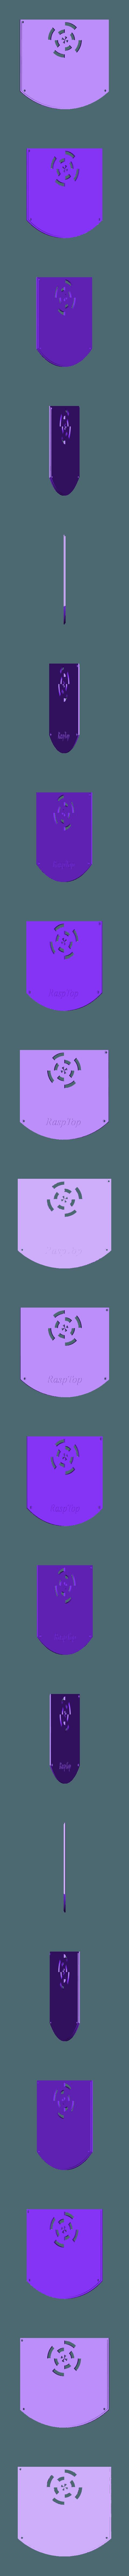 Rasptop_2.0_No_Mointor_Top.stl Download free STL file RaspTop 2.0 • Design to 3D print, EricsDIY